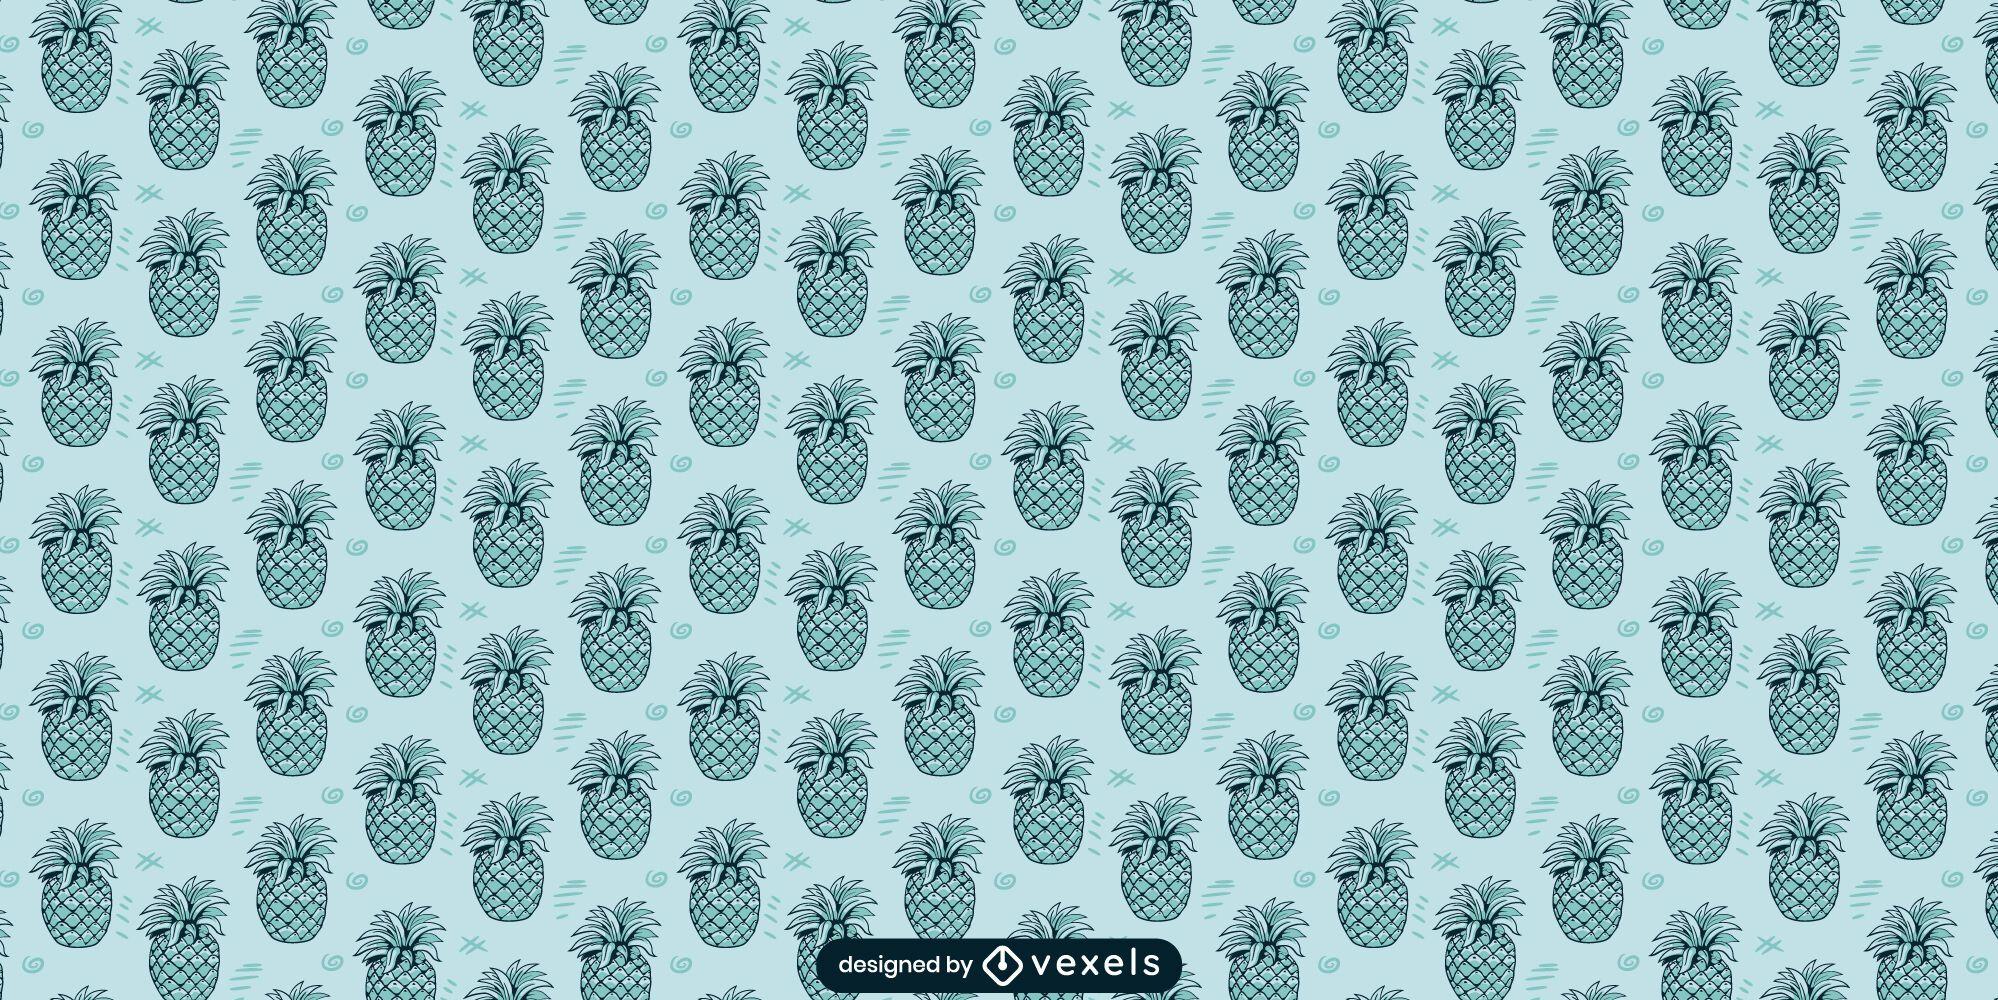 Pineapple monochrome pattern design